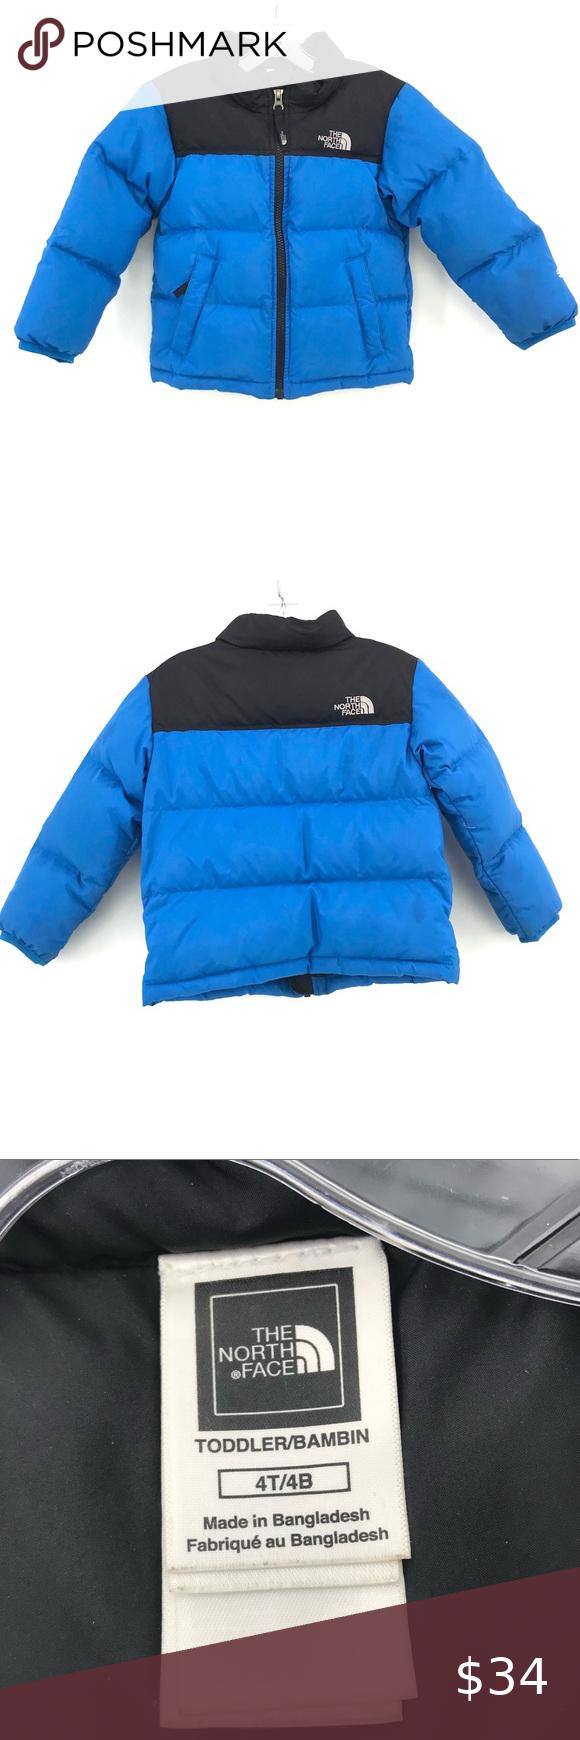 North Face Puffer Coat 4t Boys Blue Black Jacket Puffer Coat Black Jacket Jackets [ 1740 x 580 Pixel ]